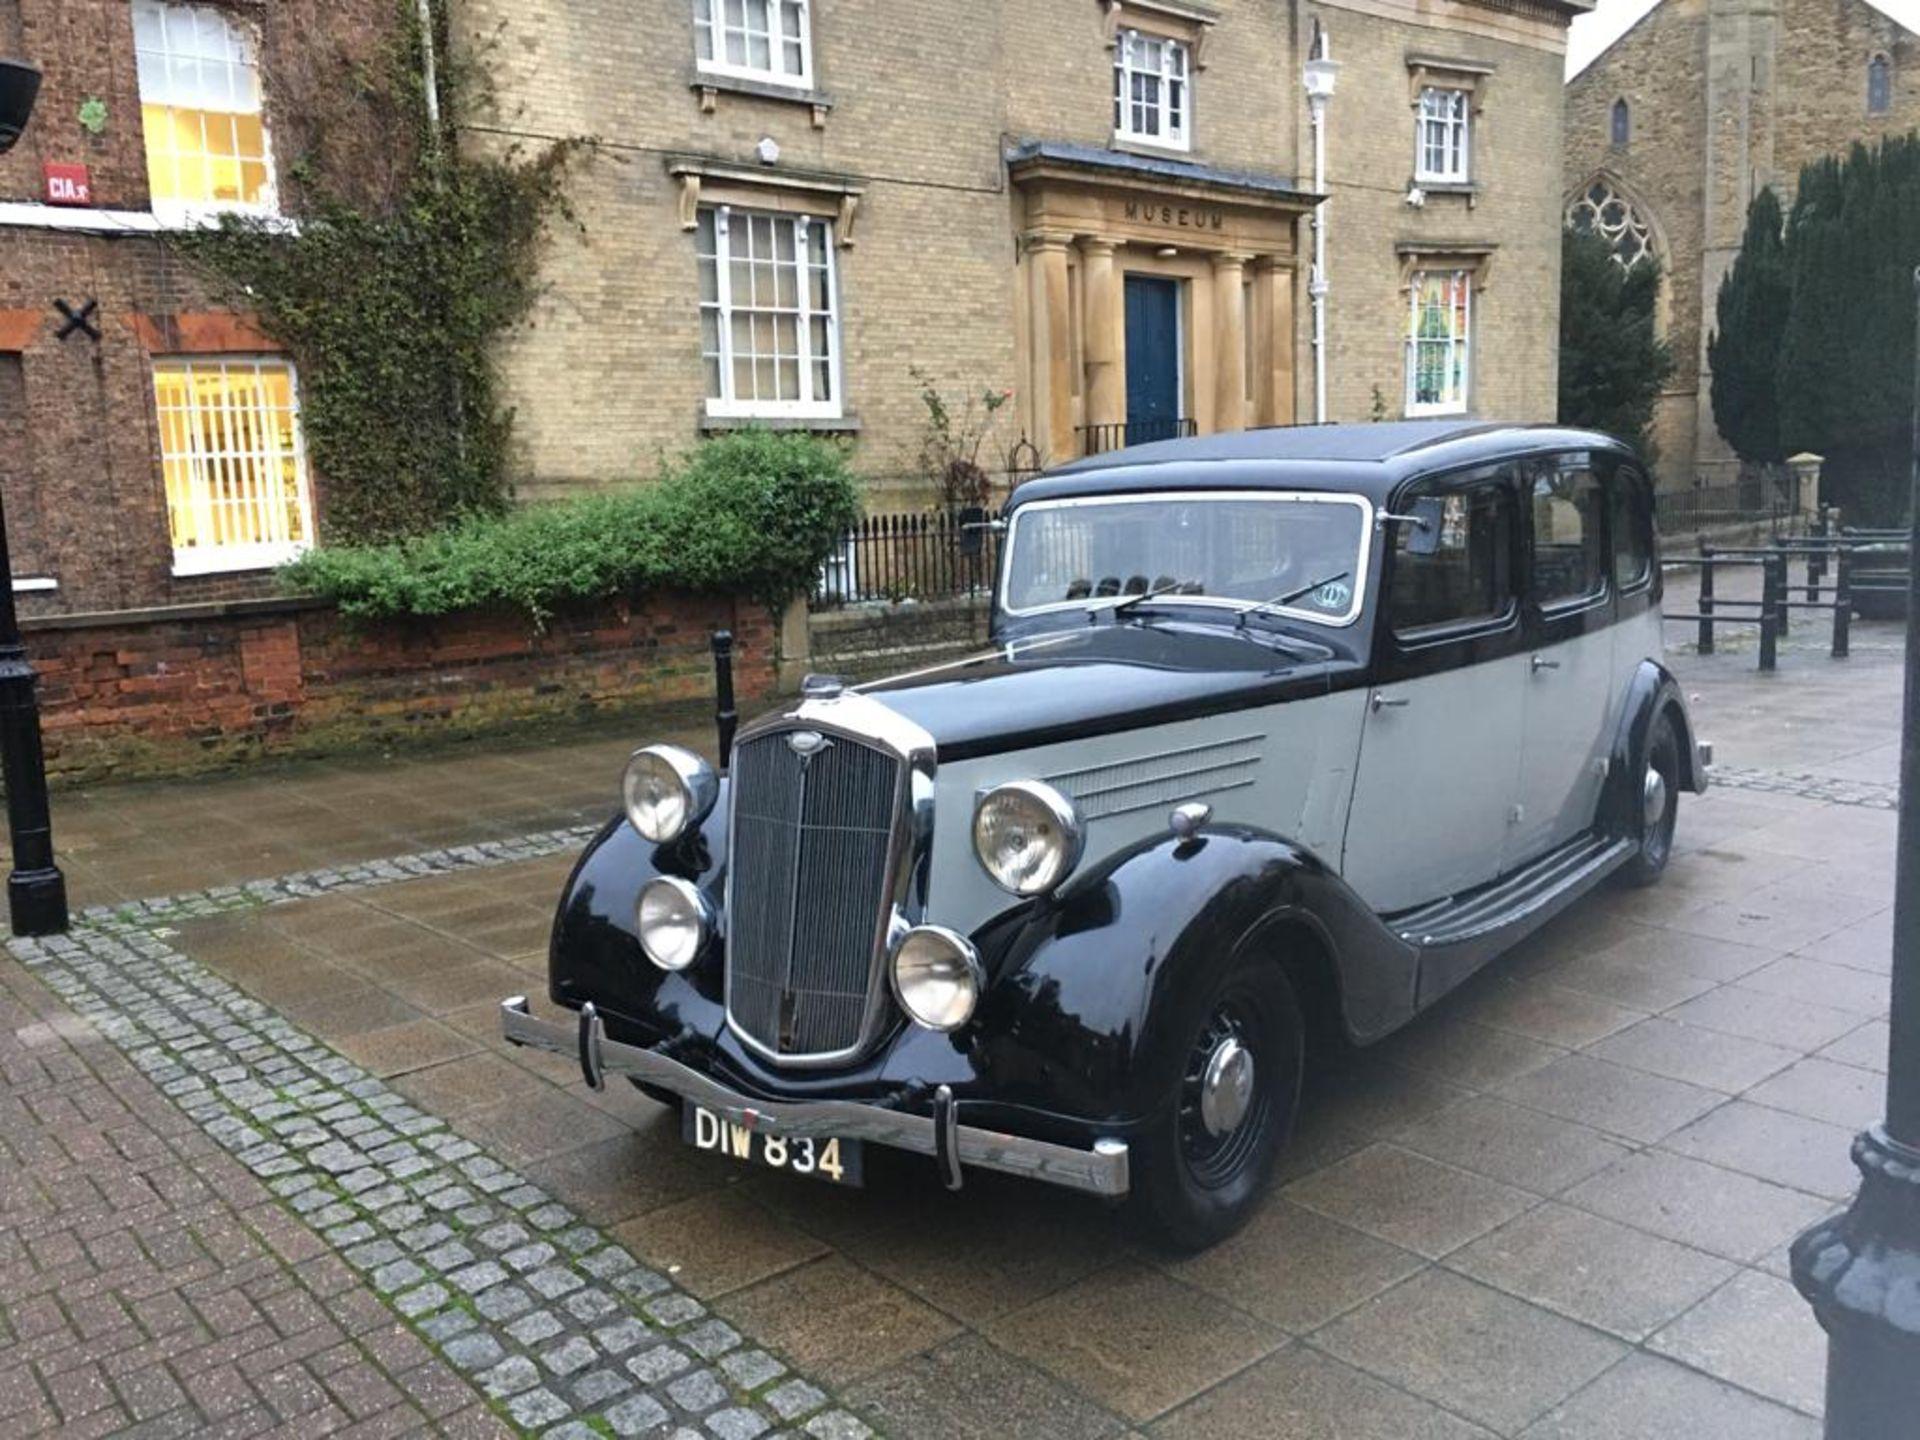 1938 WOLSELEY 25 CLASSIC 4.0 - Image 7 of 35